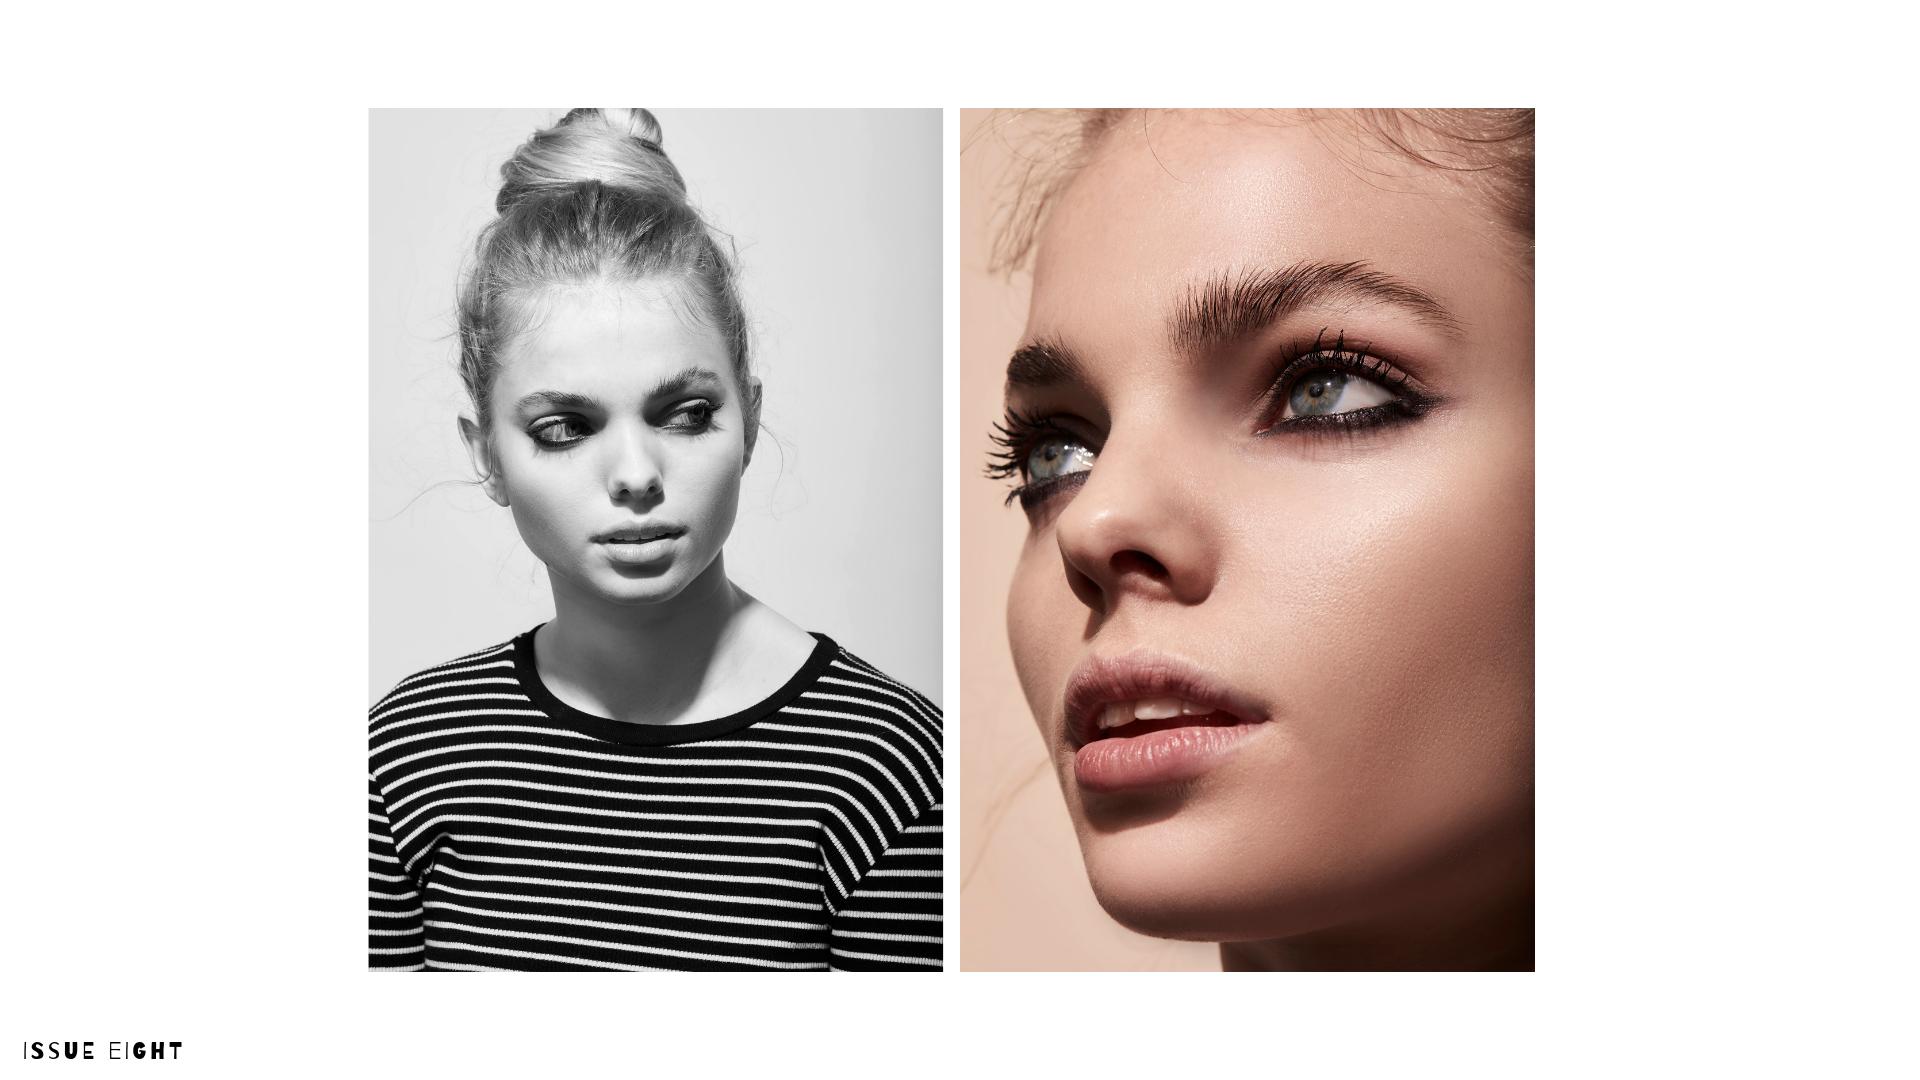 Grace wears  Sappho New Paradigm Eyeshadow in Chloe  and  Jillian Dempsey's Kôhl Eyeliner in Jet Black . Contour using  Sappho New Paradigm Sappho New Paradigm Pressed Powder in Caramel